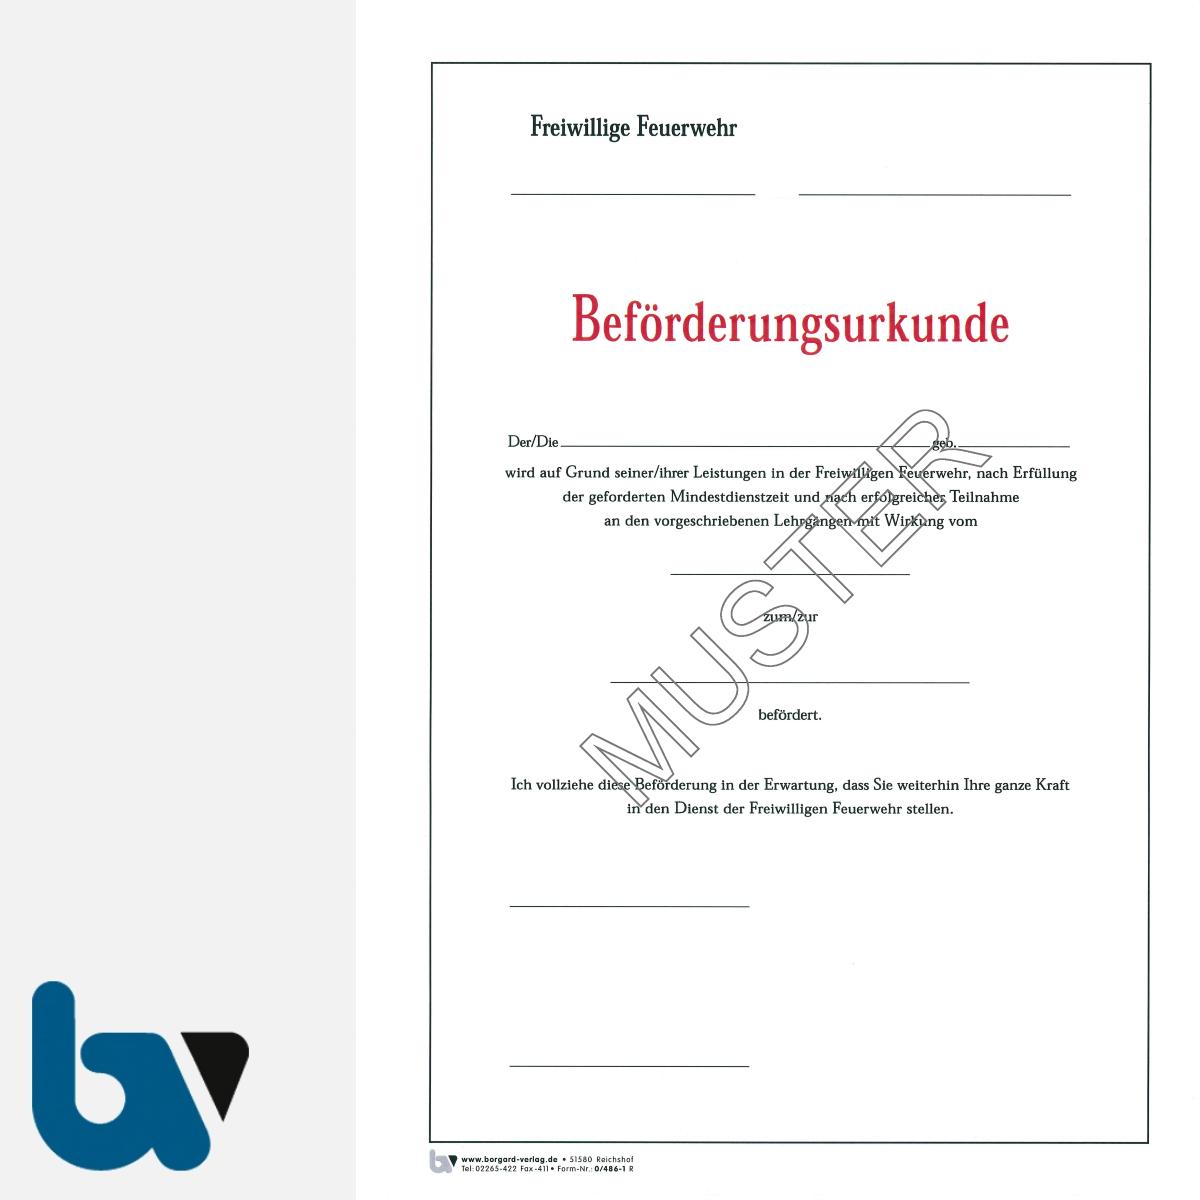 0/486-1 Beförderungsurkunde Feuerwehr Karton DIN A4 | Borgard Verlag GmbH